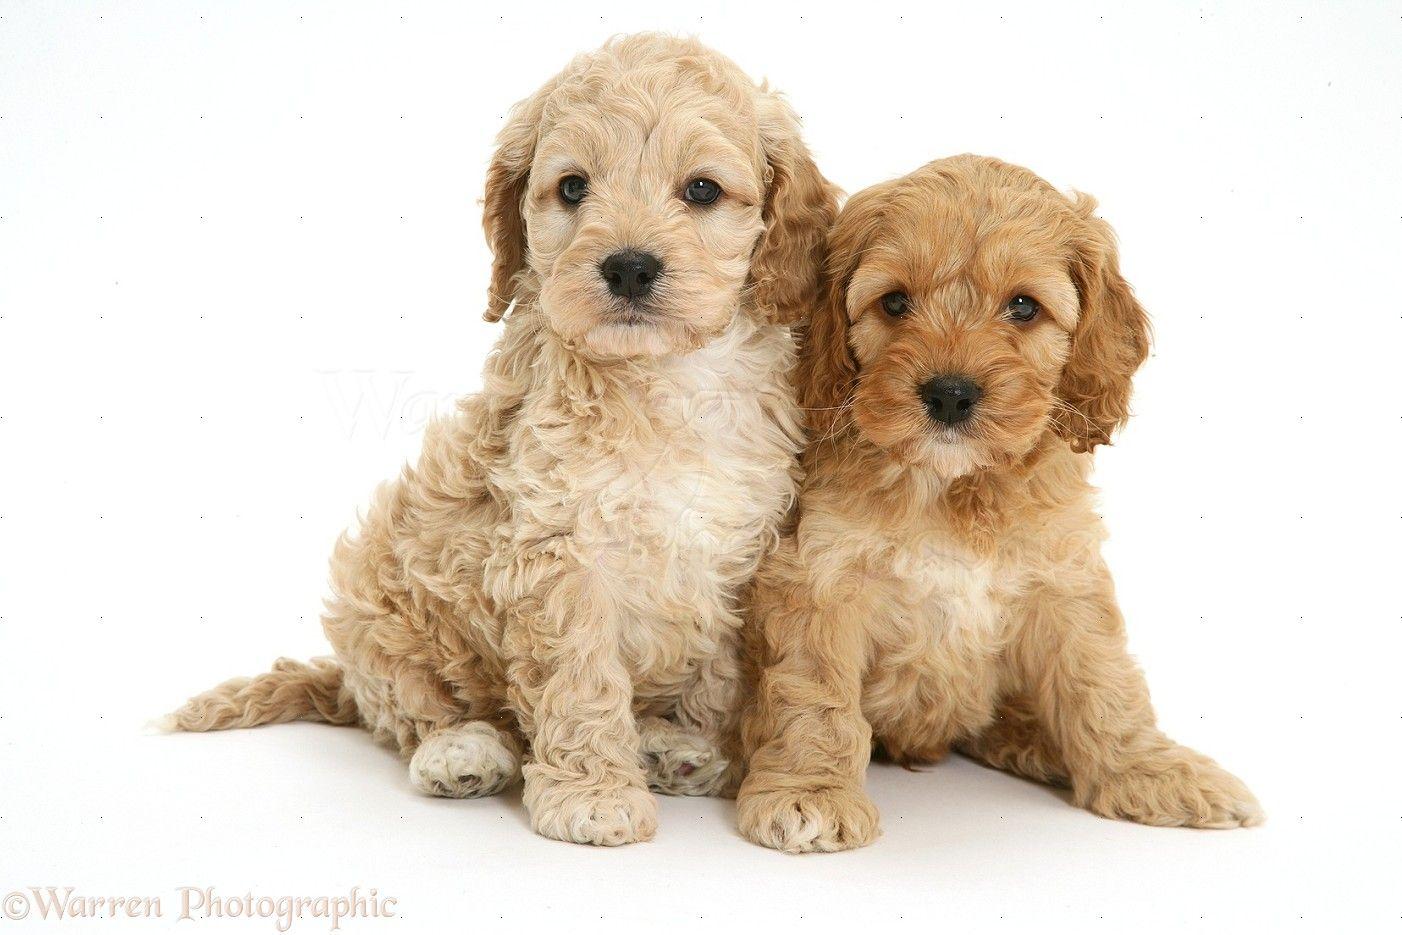 Two Cockapoo pups Cockapoo puppies, Cockapoo, Puppies